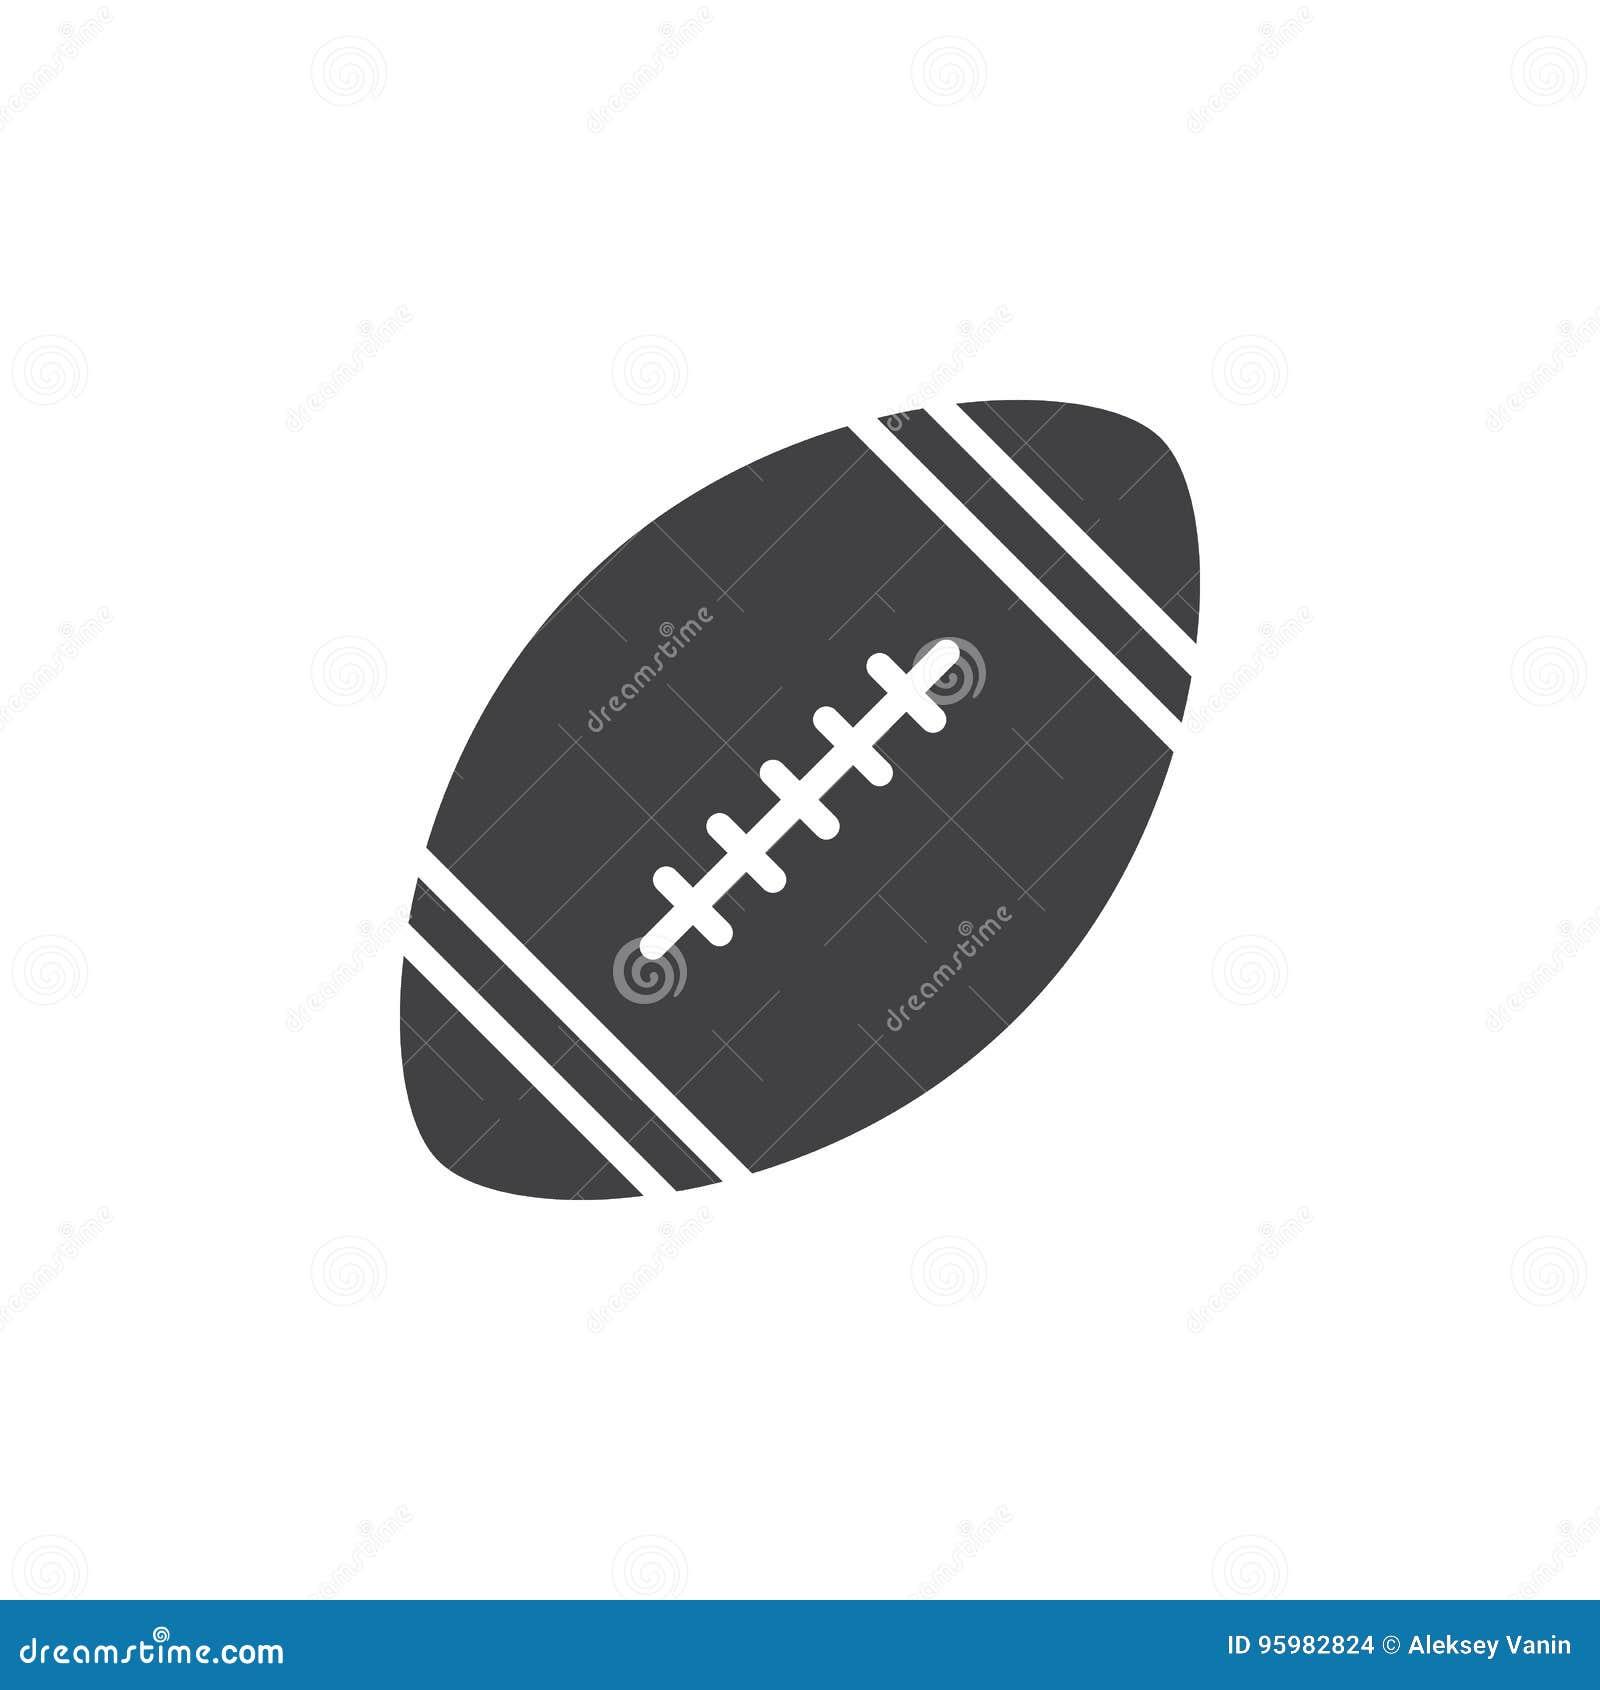 Vetor do ícone da bola do futebol americano, sinal liso enchido, pictograma contínuo isolado no branco